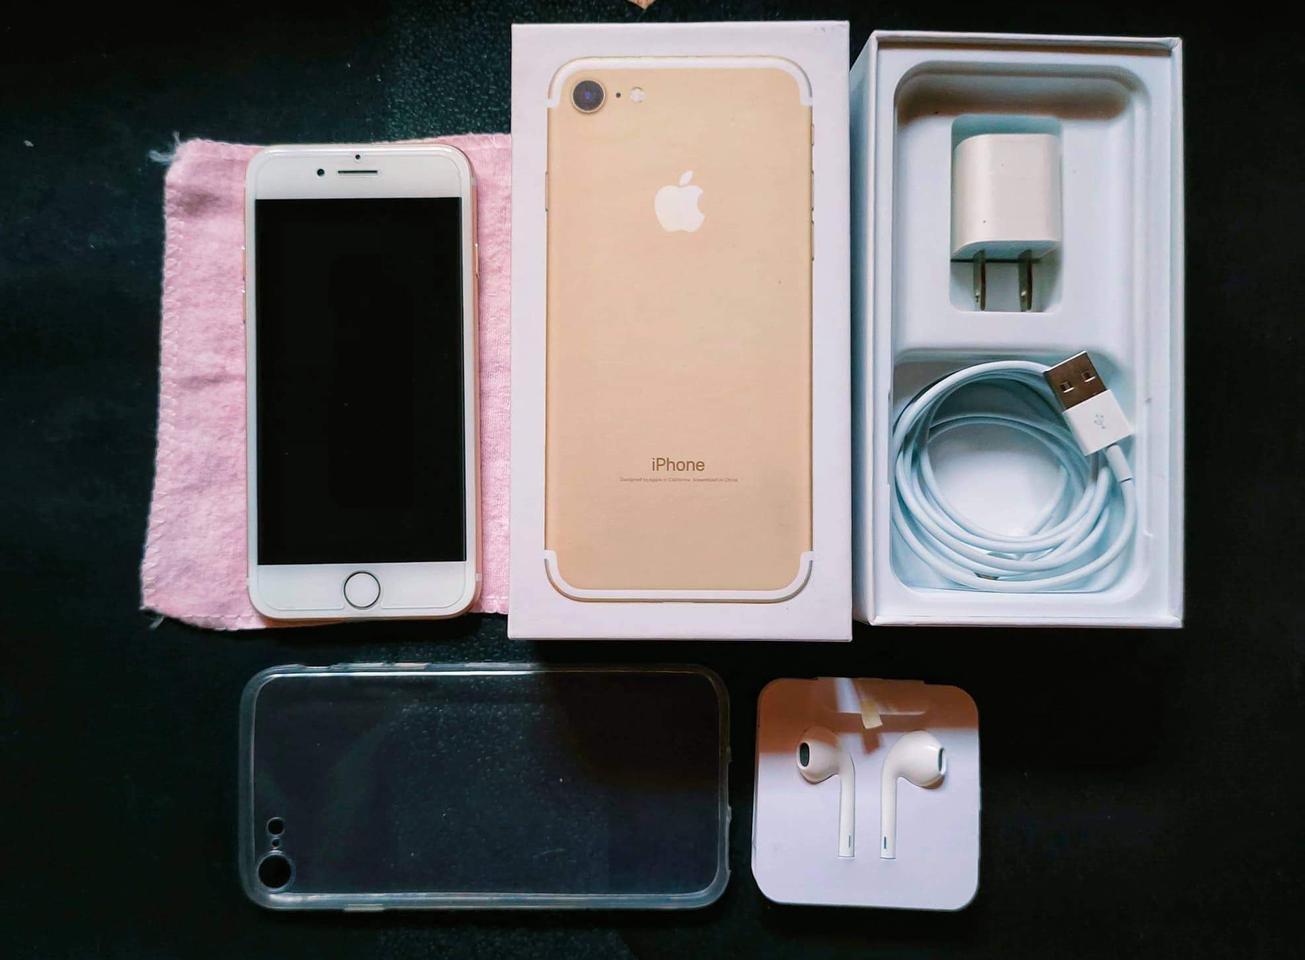 iPhone7 มือสอง 128G สีทอง รูปที่ 1